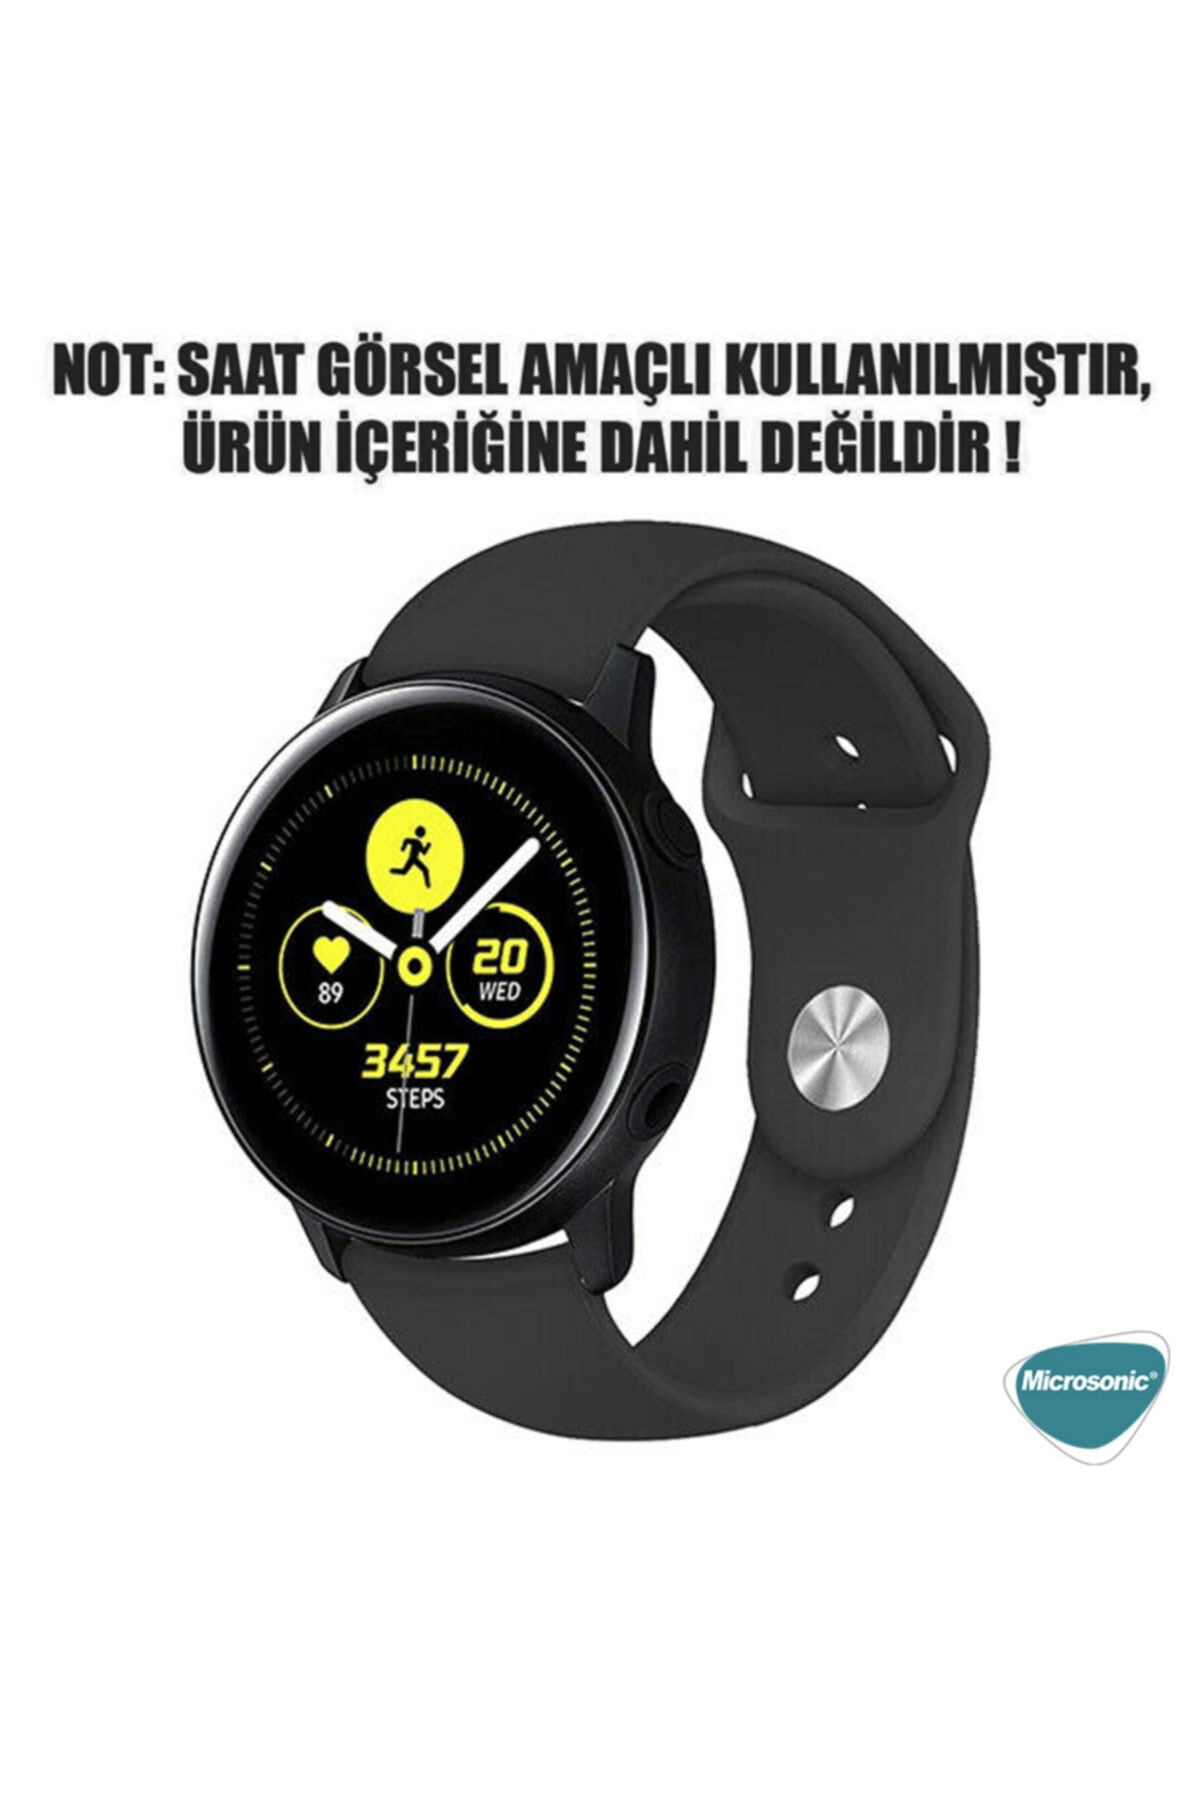 Microsonic Samsung Gear S3 Classic Silicone Sport Band Sarı 2